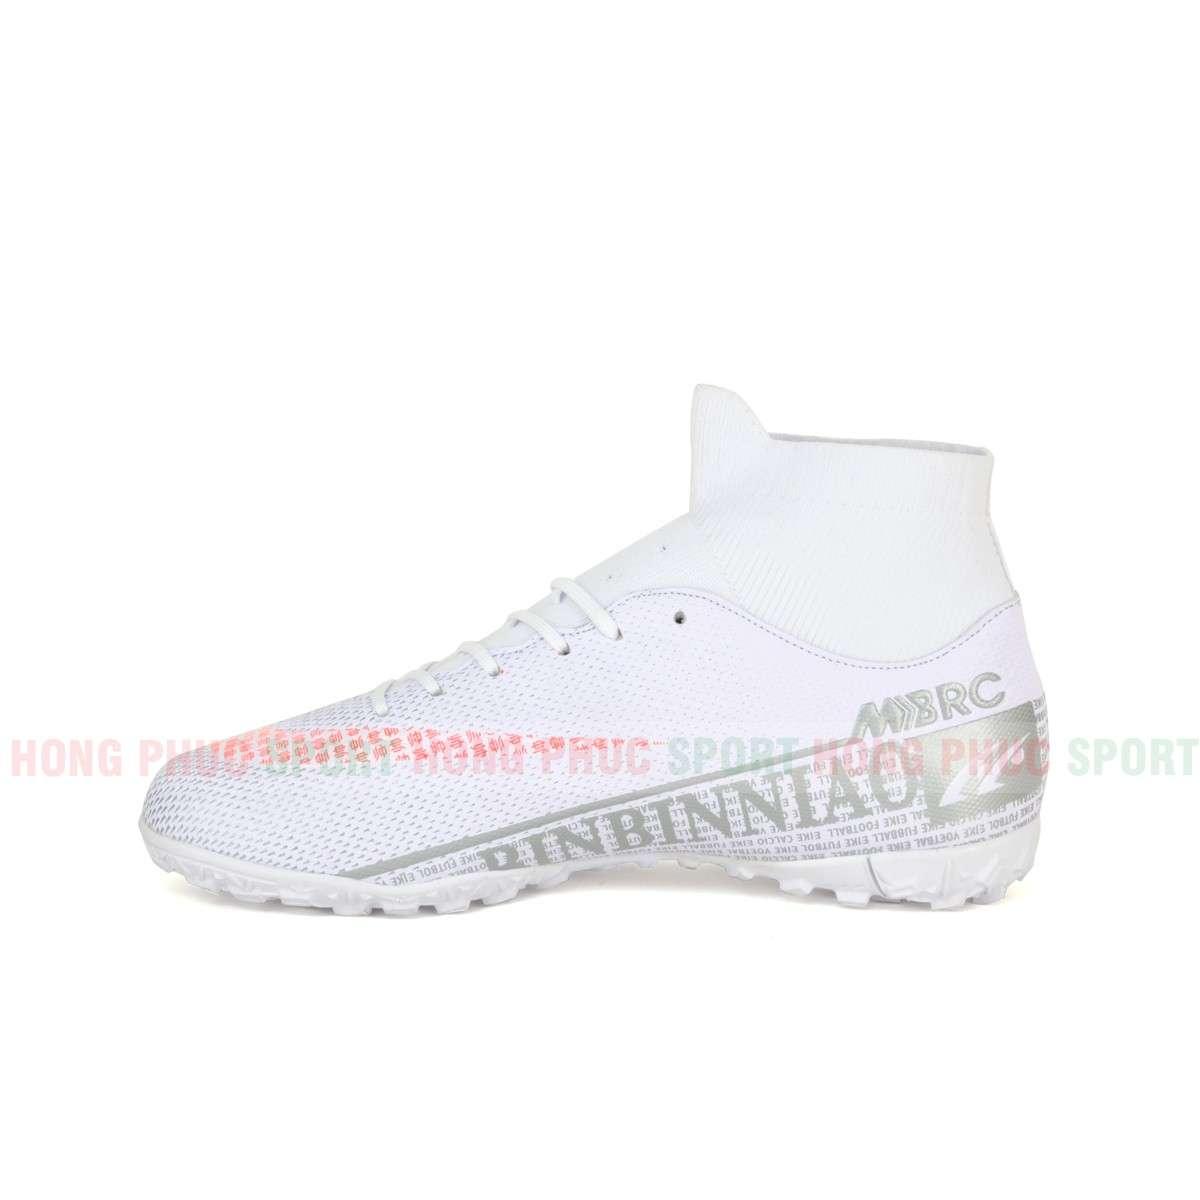 Giày đá bóng cổ cao Mercurial Superfly VII 2020 TF White